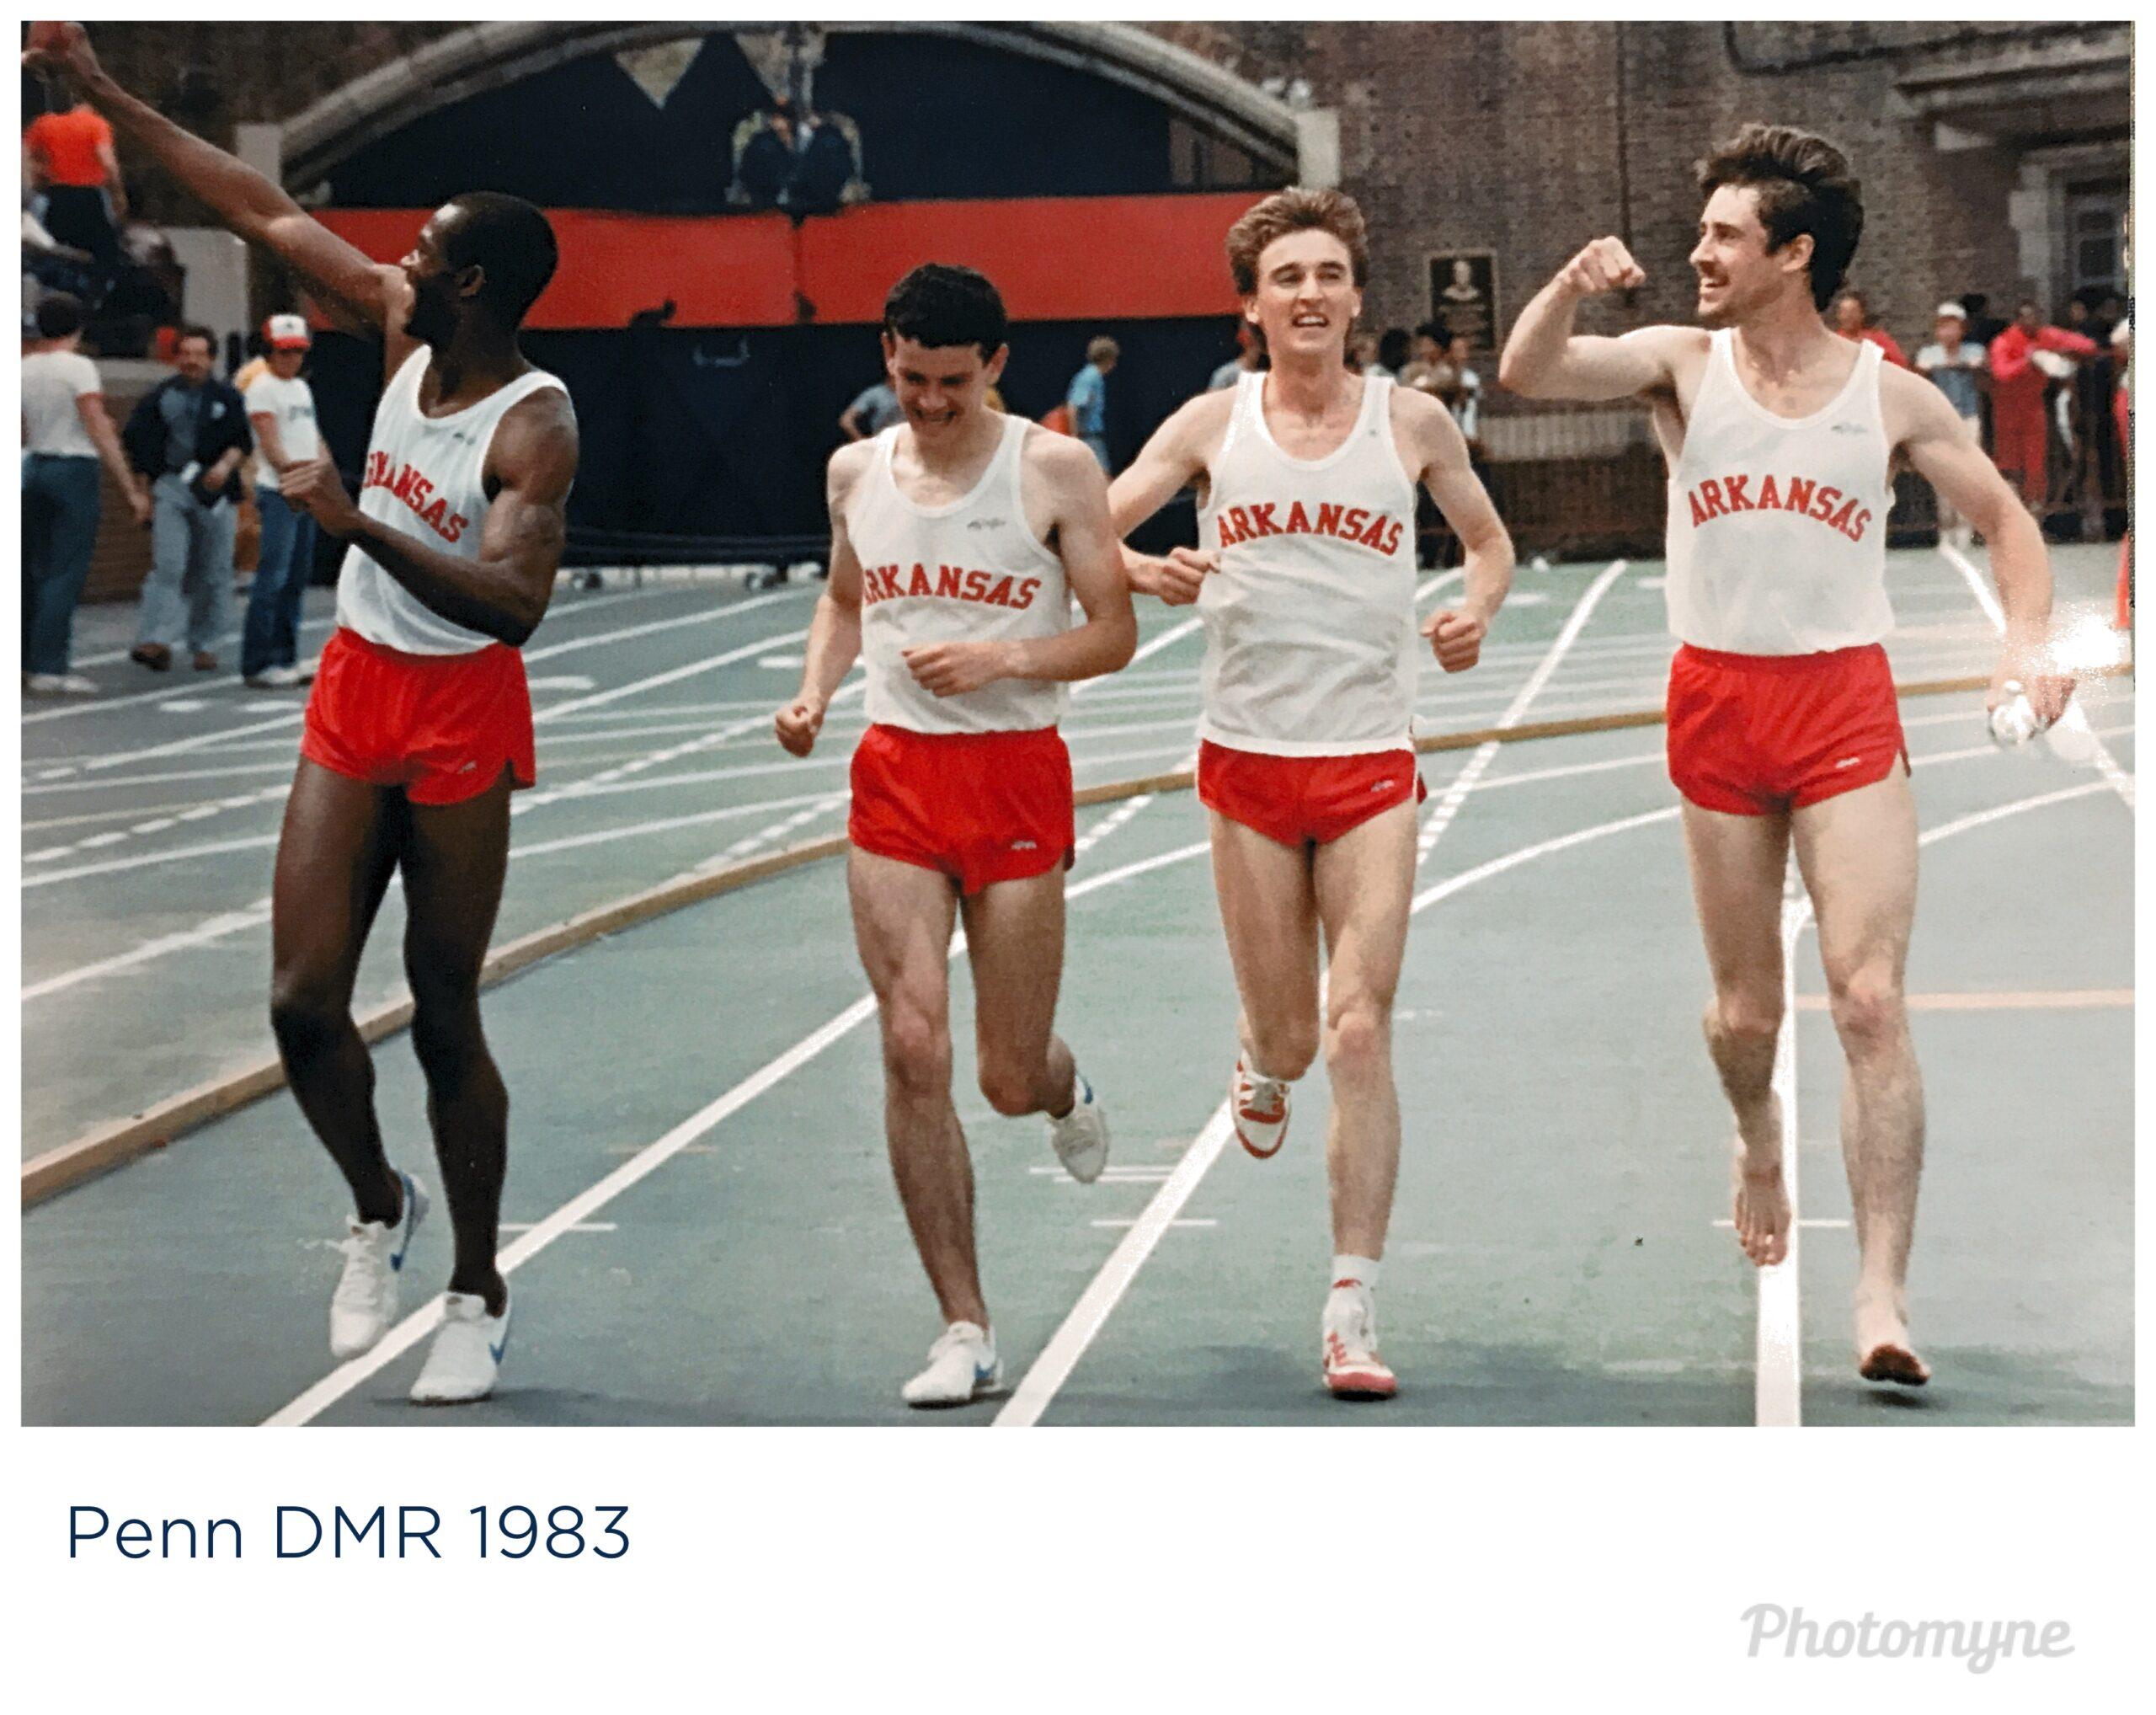 1983  DMR - First Penn Victory